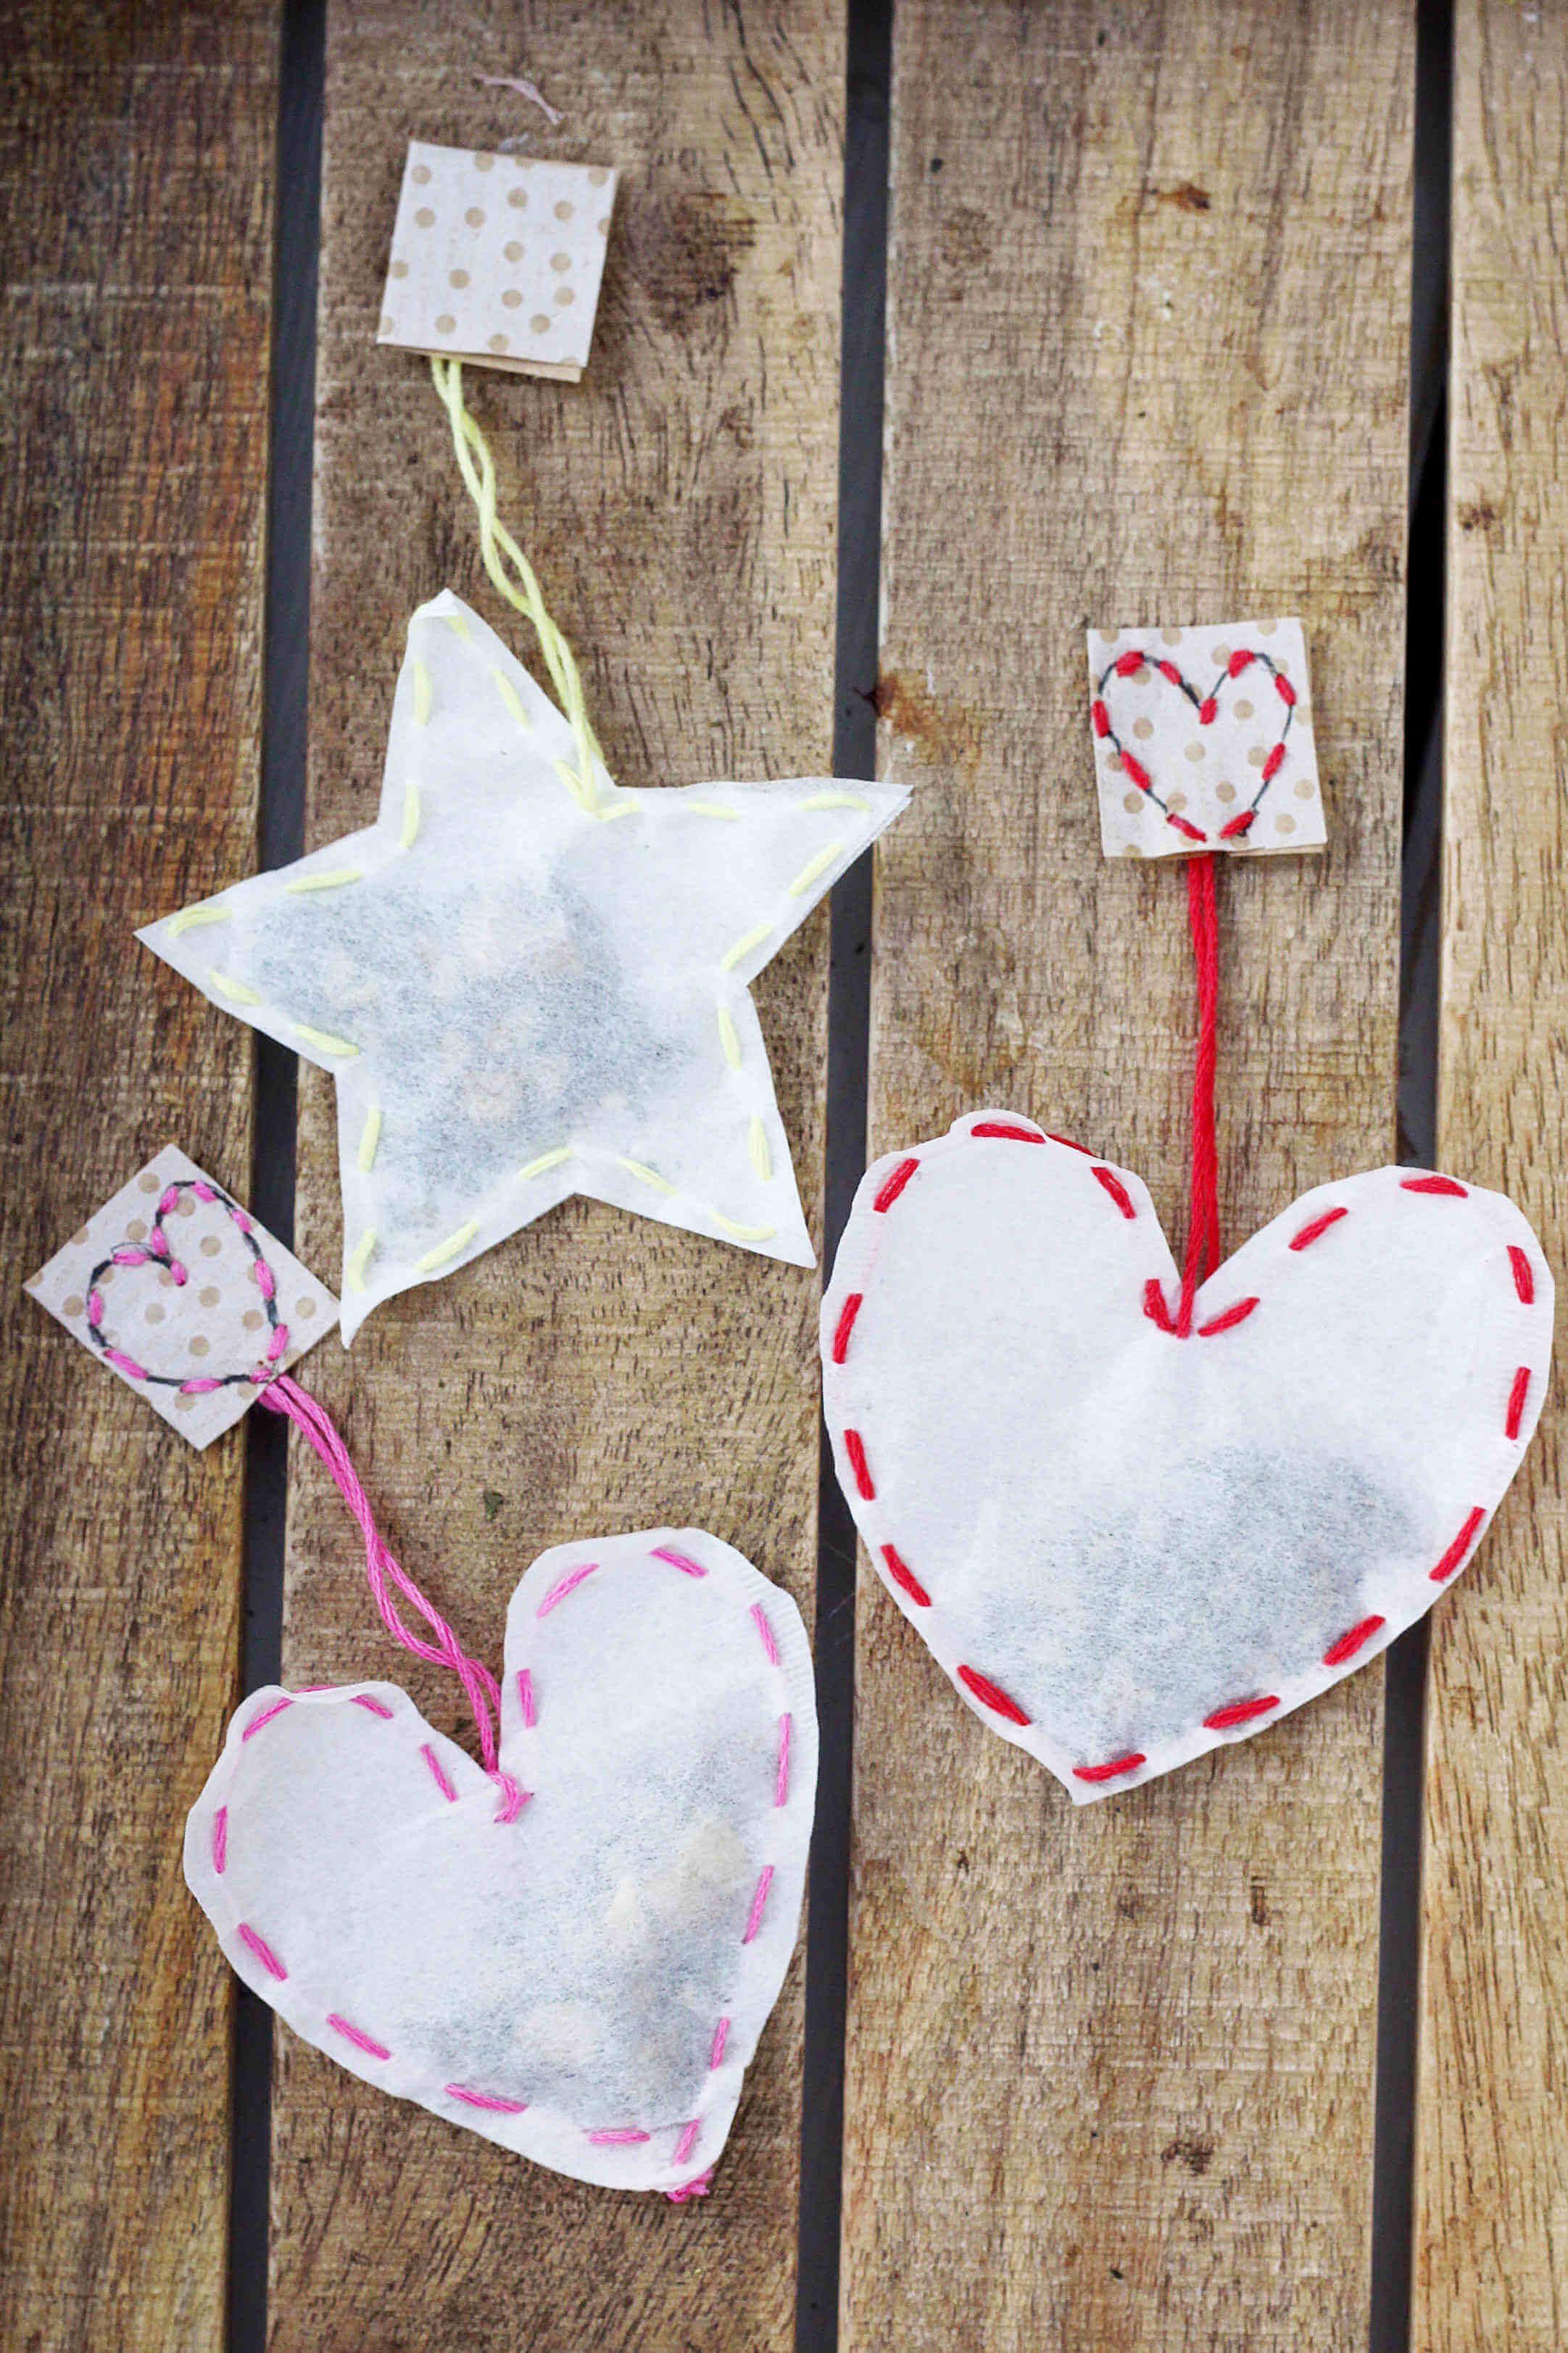 diy-geschenk-geschenkidee-teebeutel-selbermachen-weihnachten-diy-blog